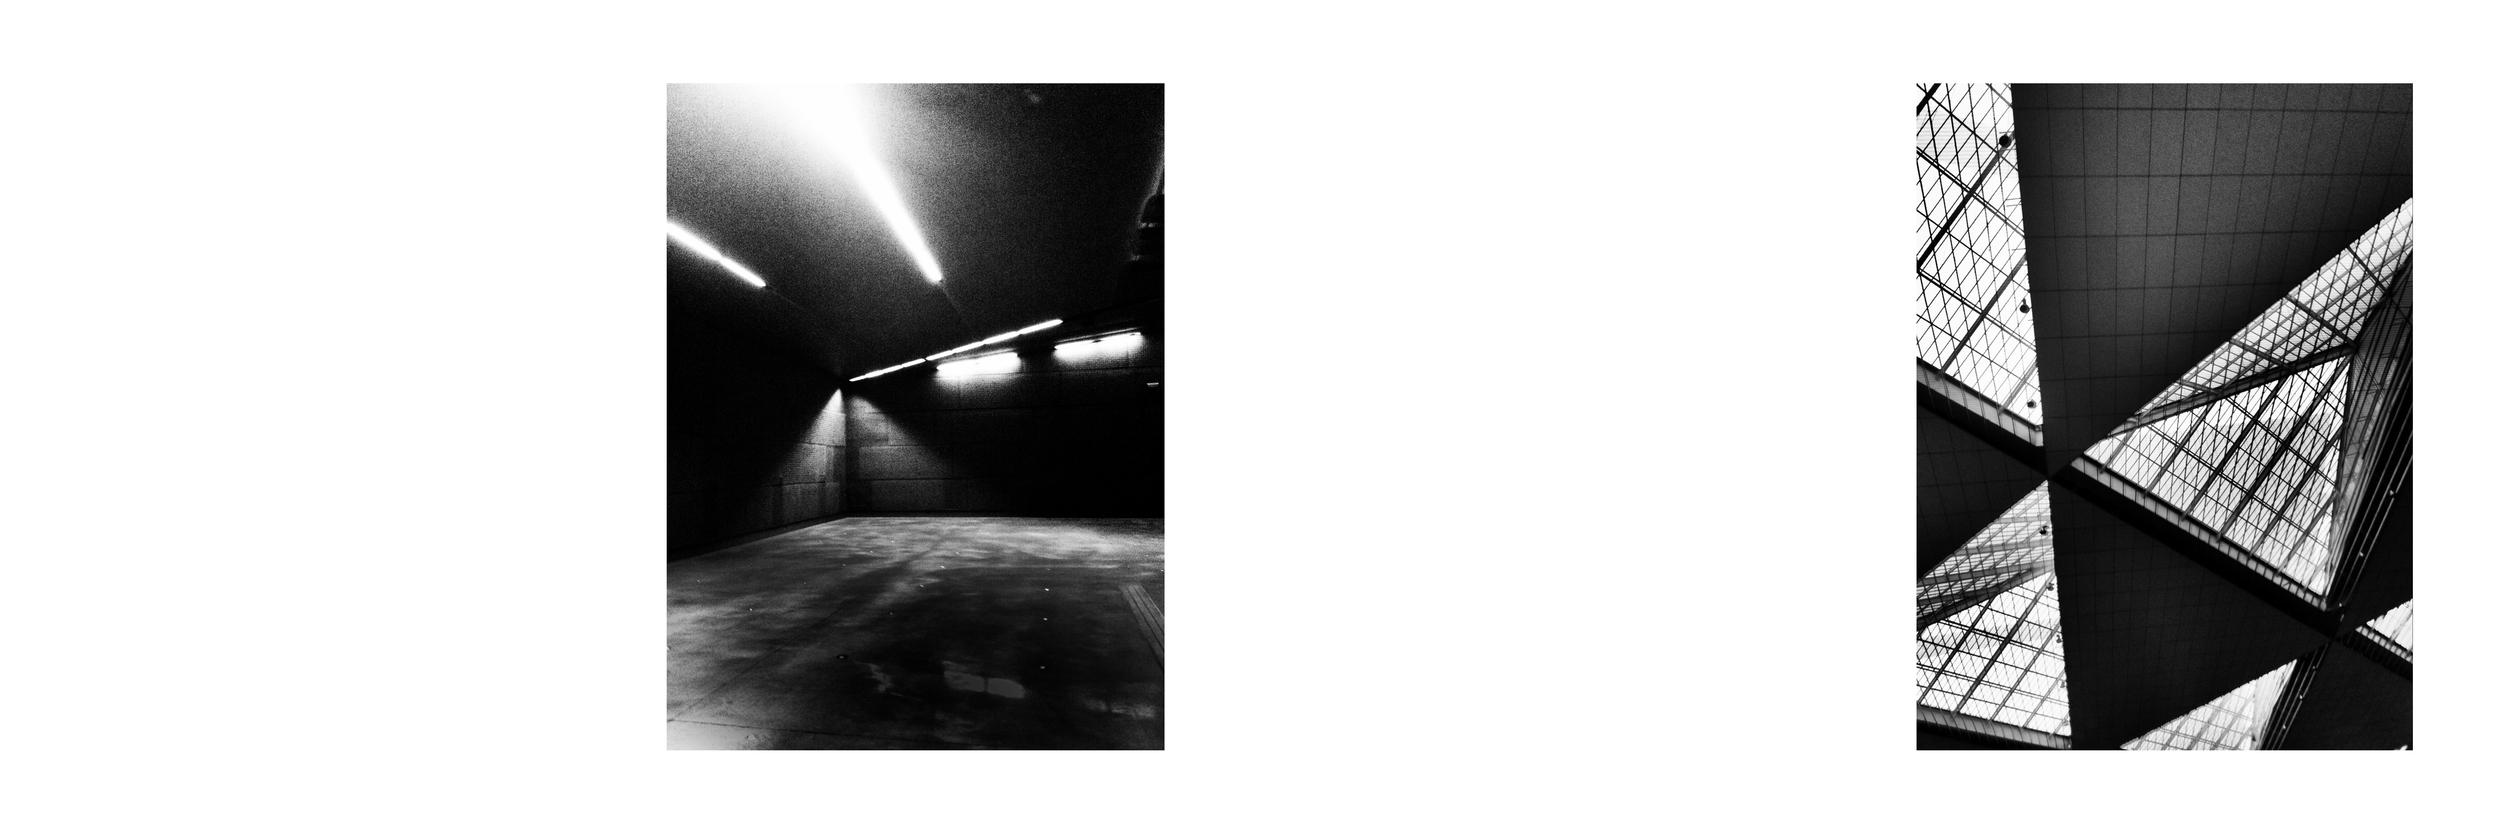 METRO-CITY_05219.jpg